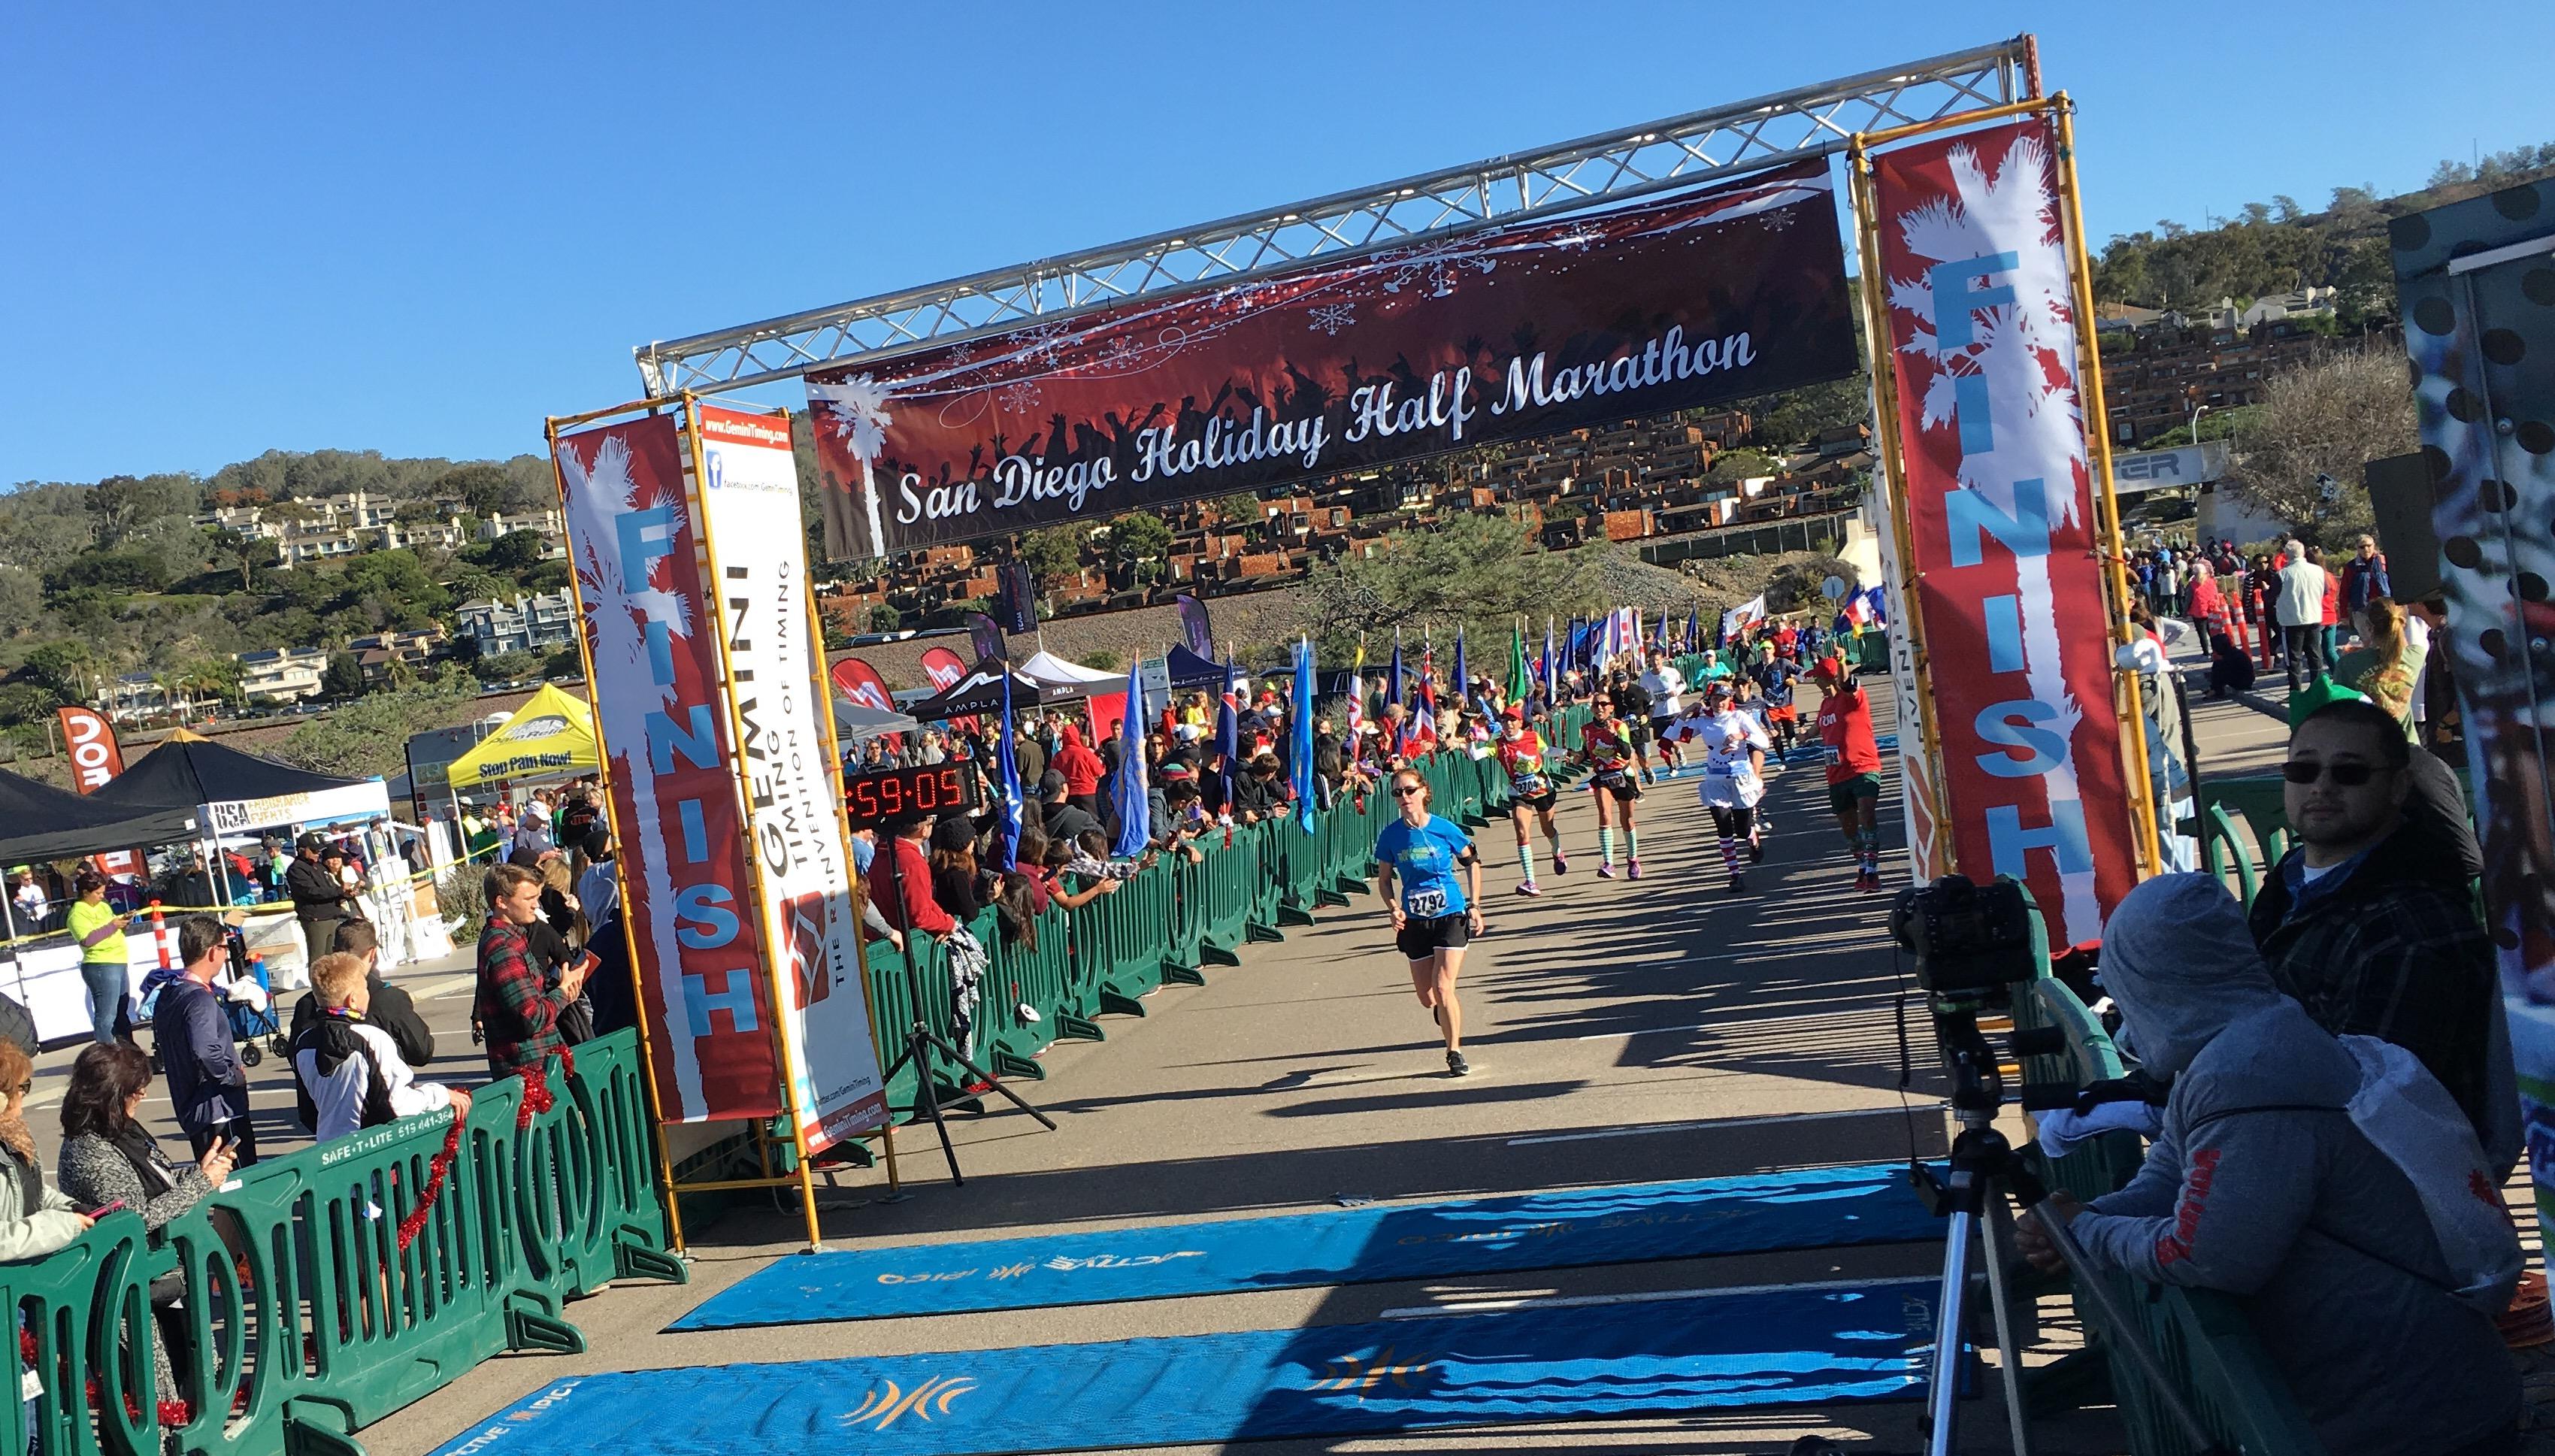 San Diego Holiday Half Marathon